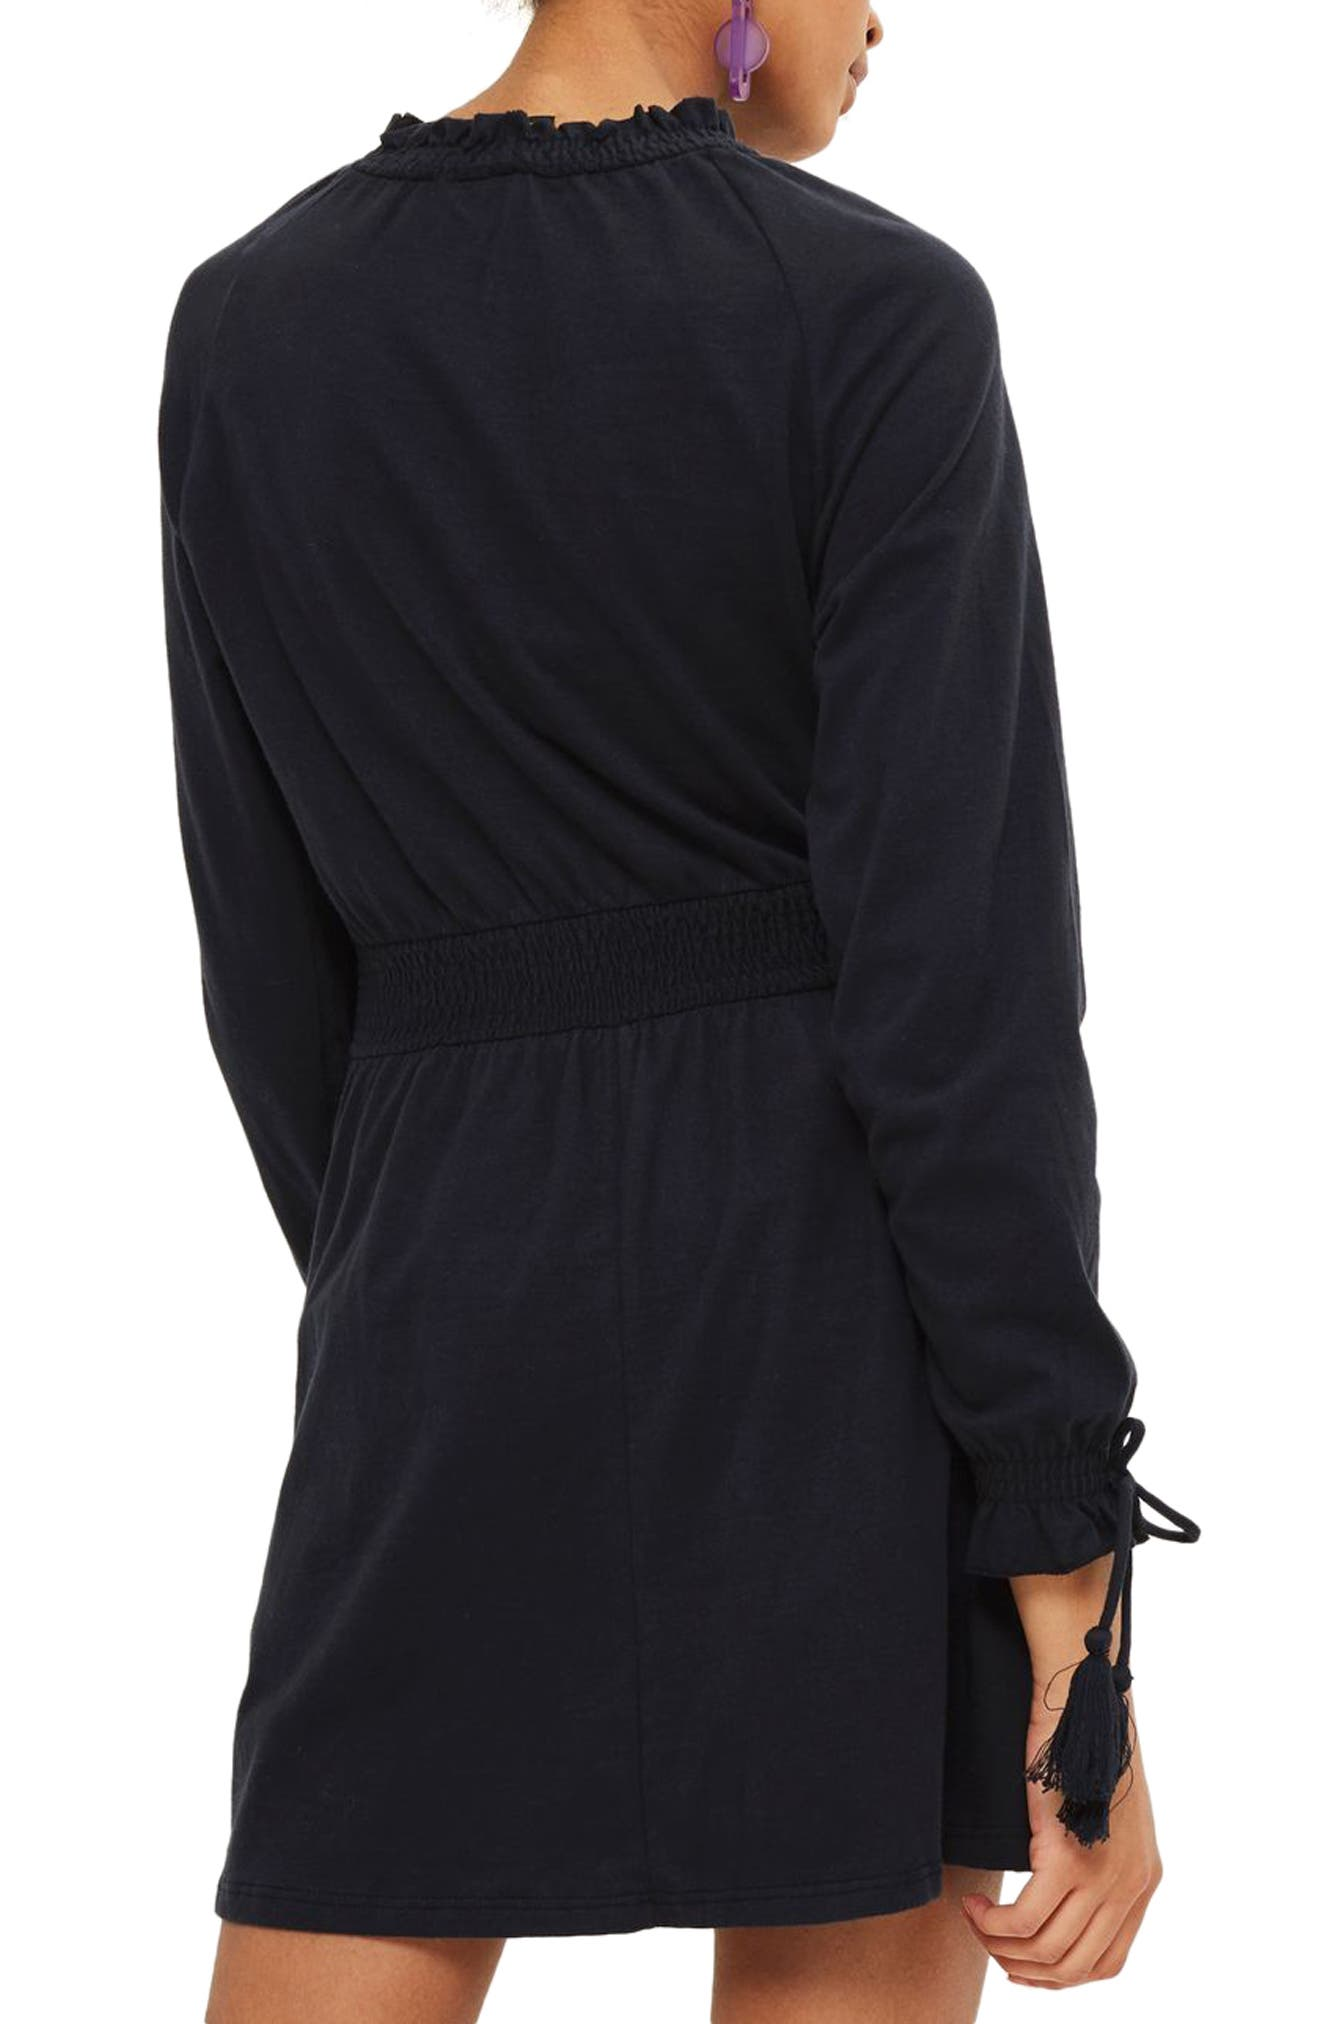 Ruffle Collar Smock Dress,                             Alternate thumbnail 2, color,                             Navy Blue